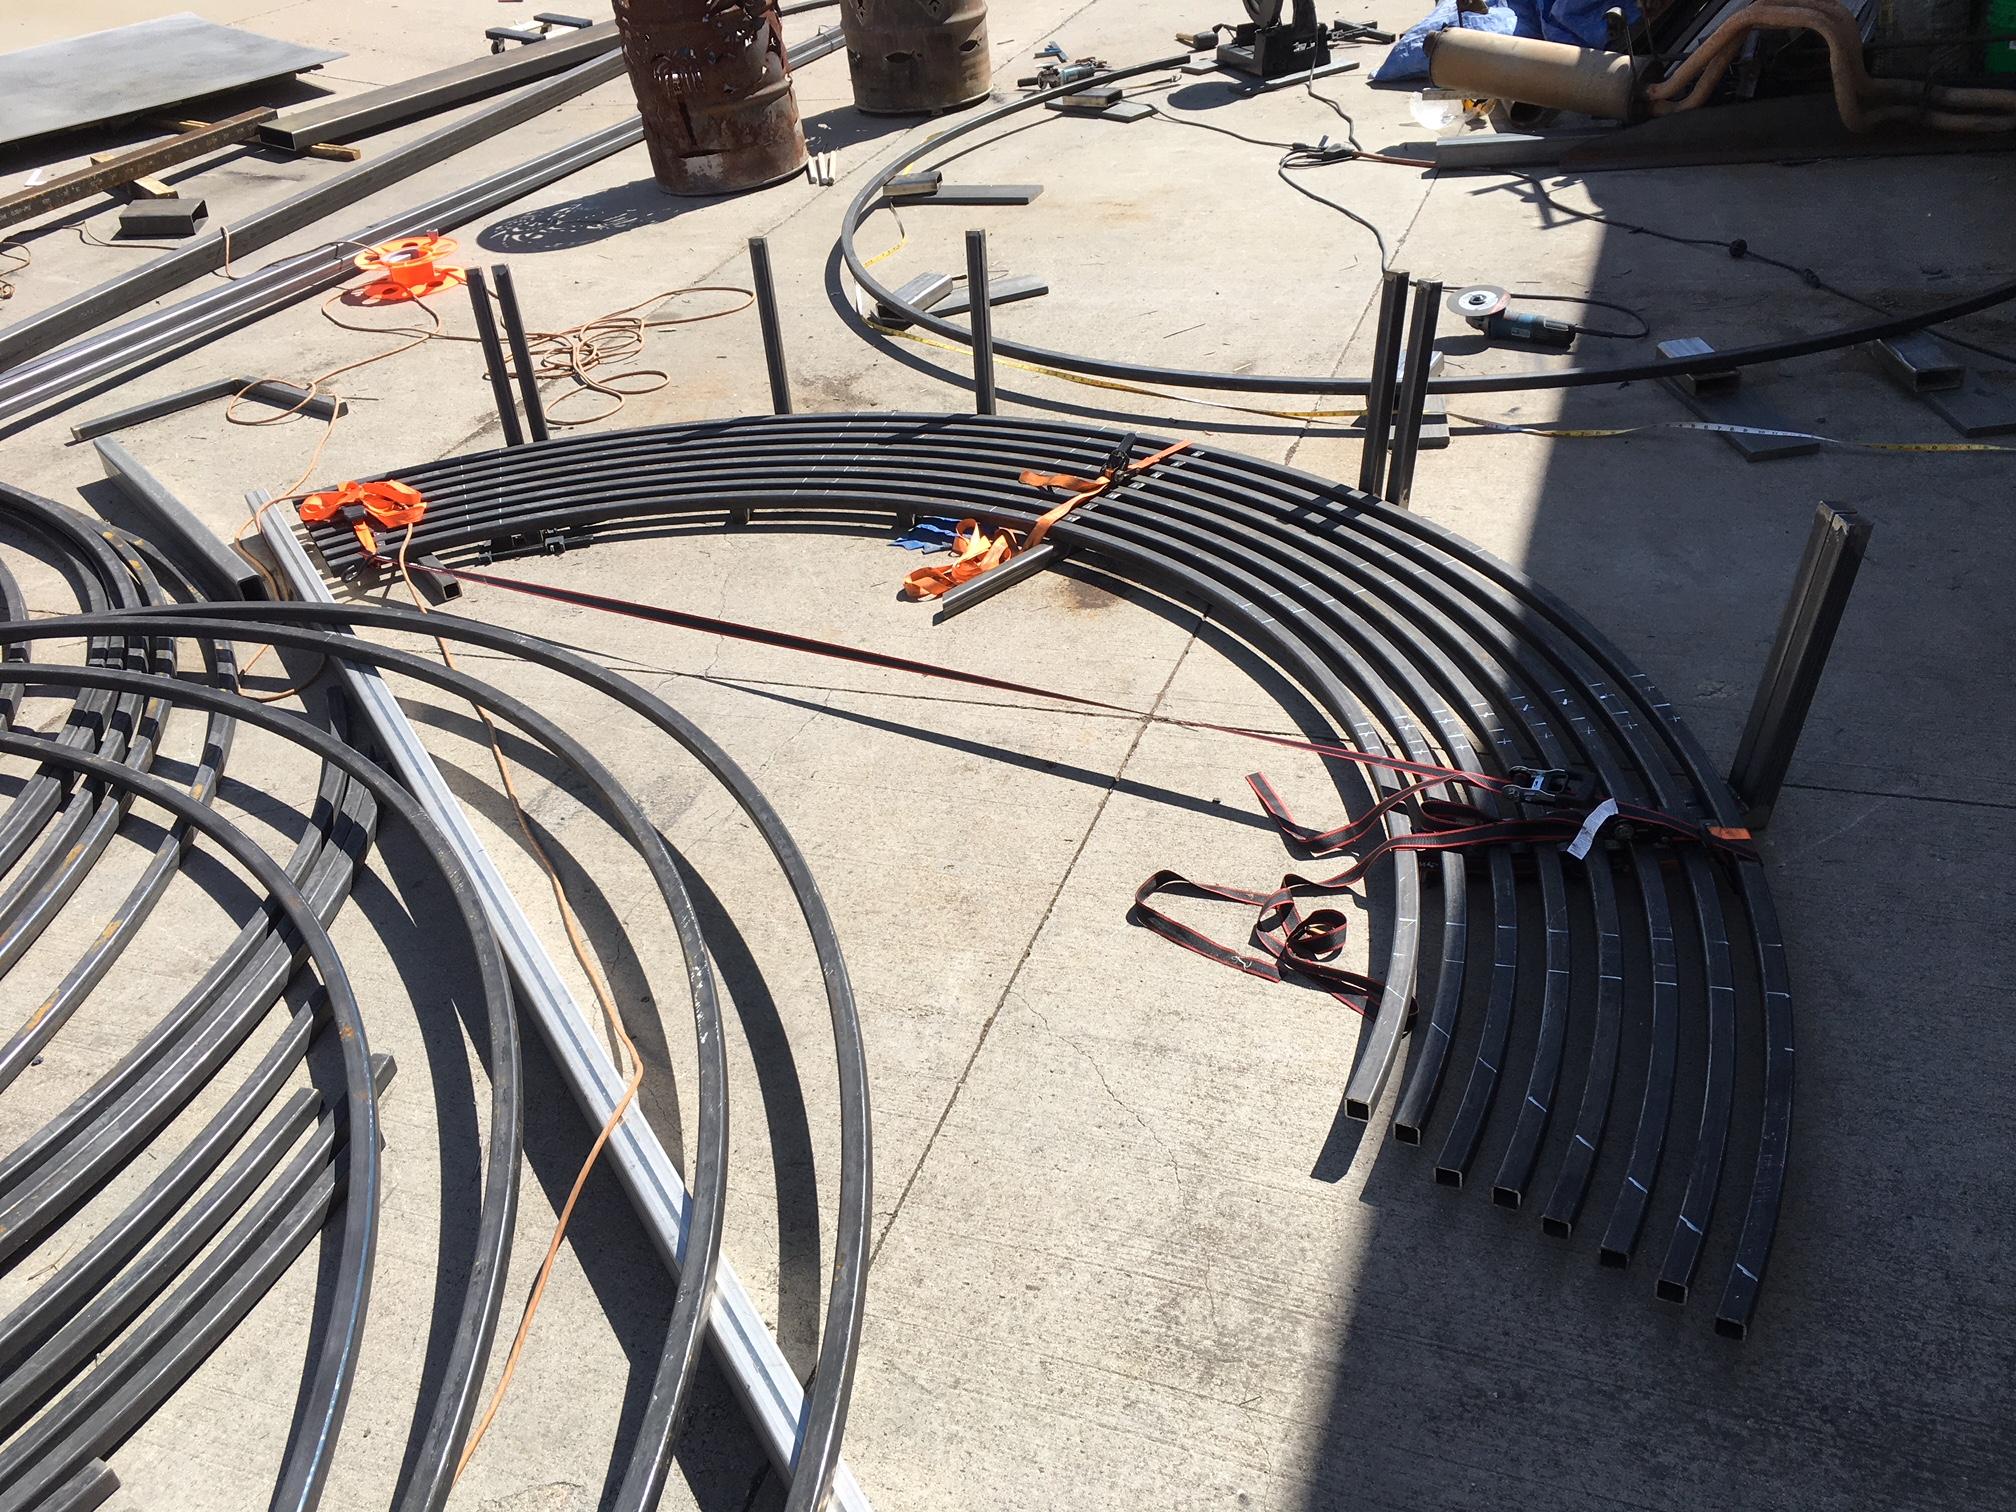 Matthew Geller_Springs_Colorado Springs_Public Art Services_J Grant Projects_5.JPG